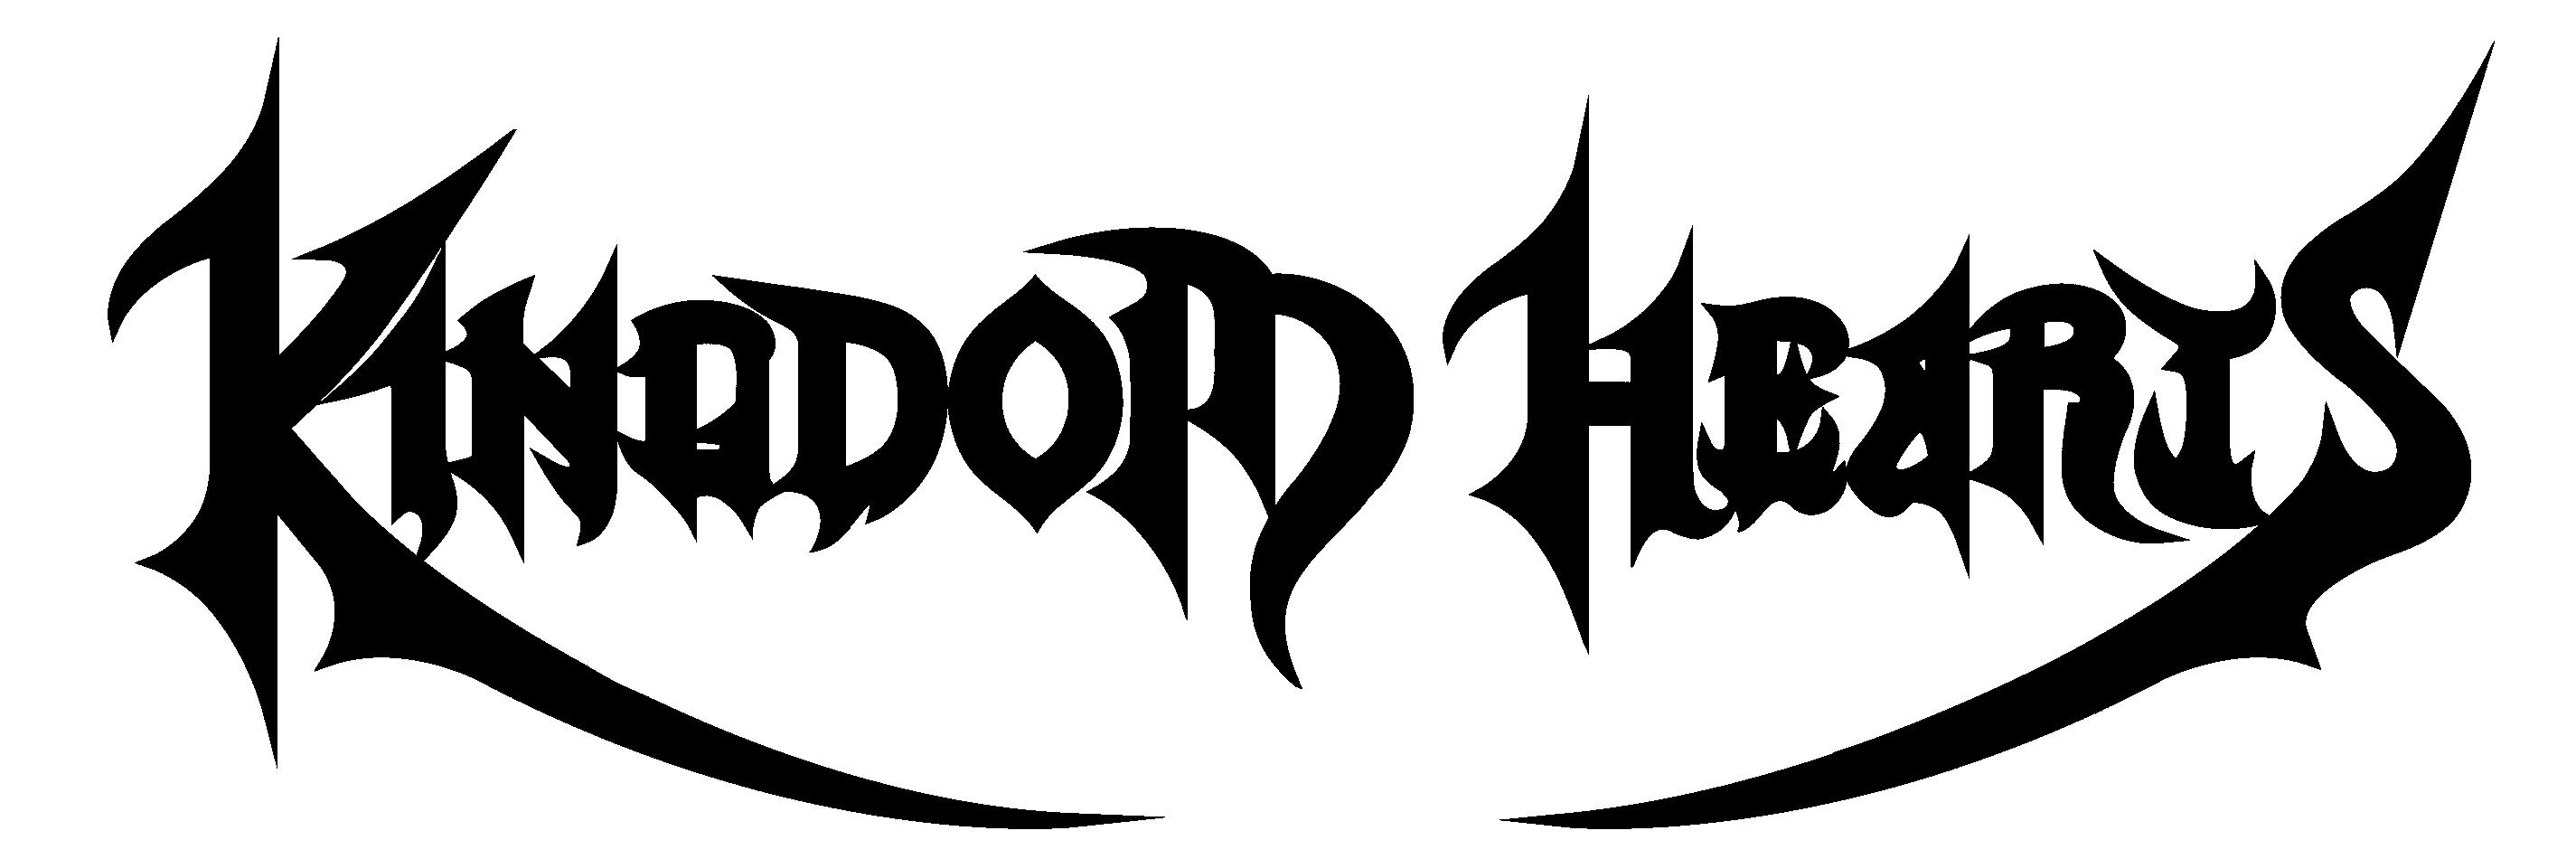 Kingdom hearts logo png. File wordmark the third